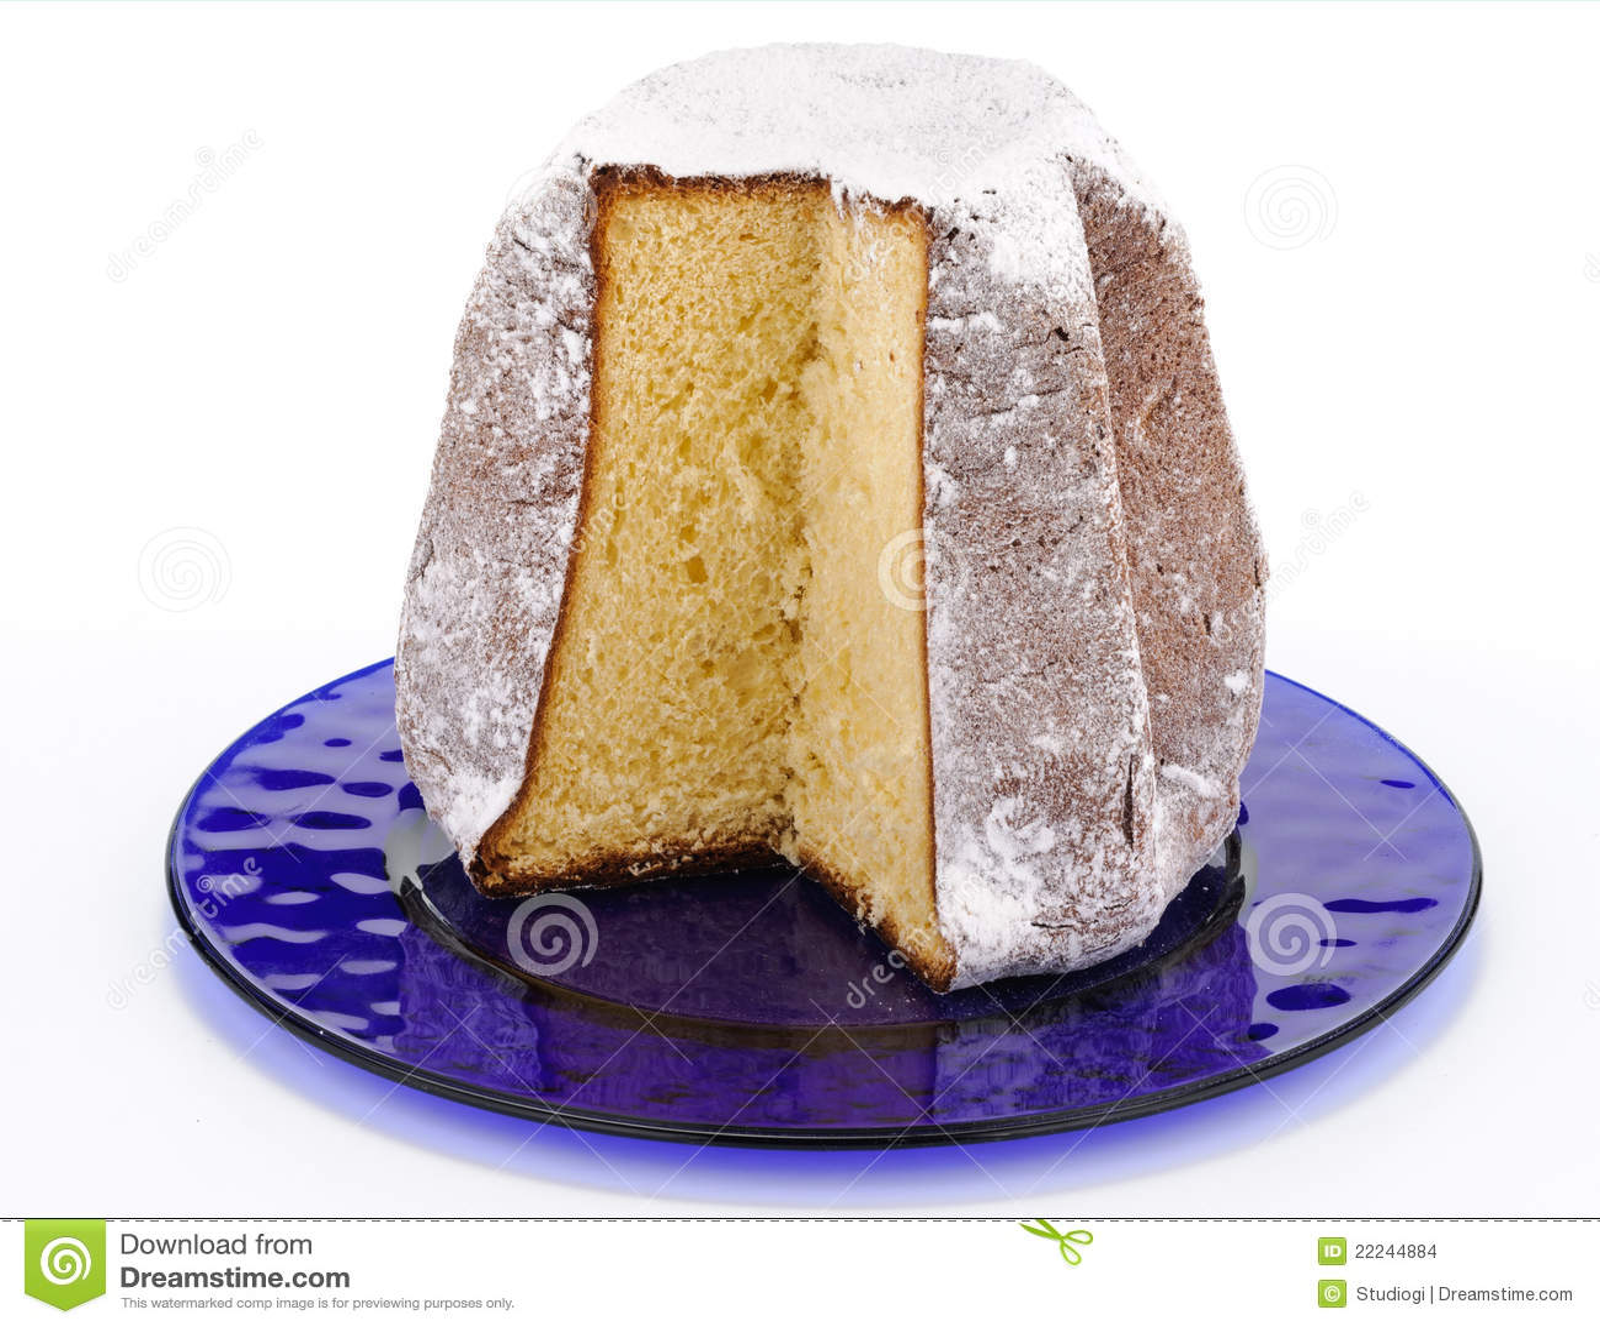 Pandoro, typical italian Christmas cake